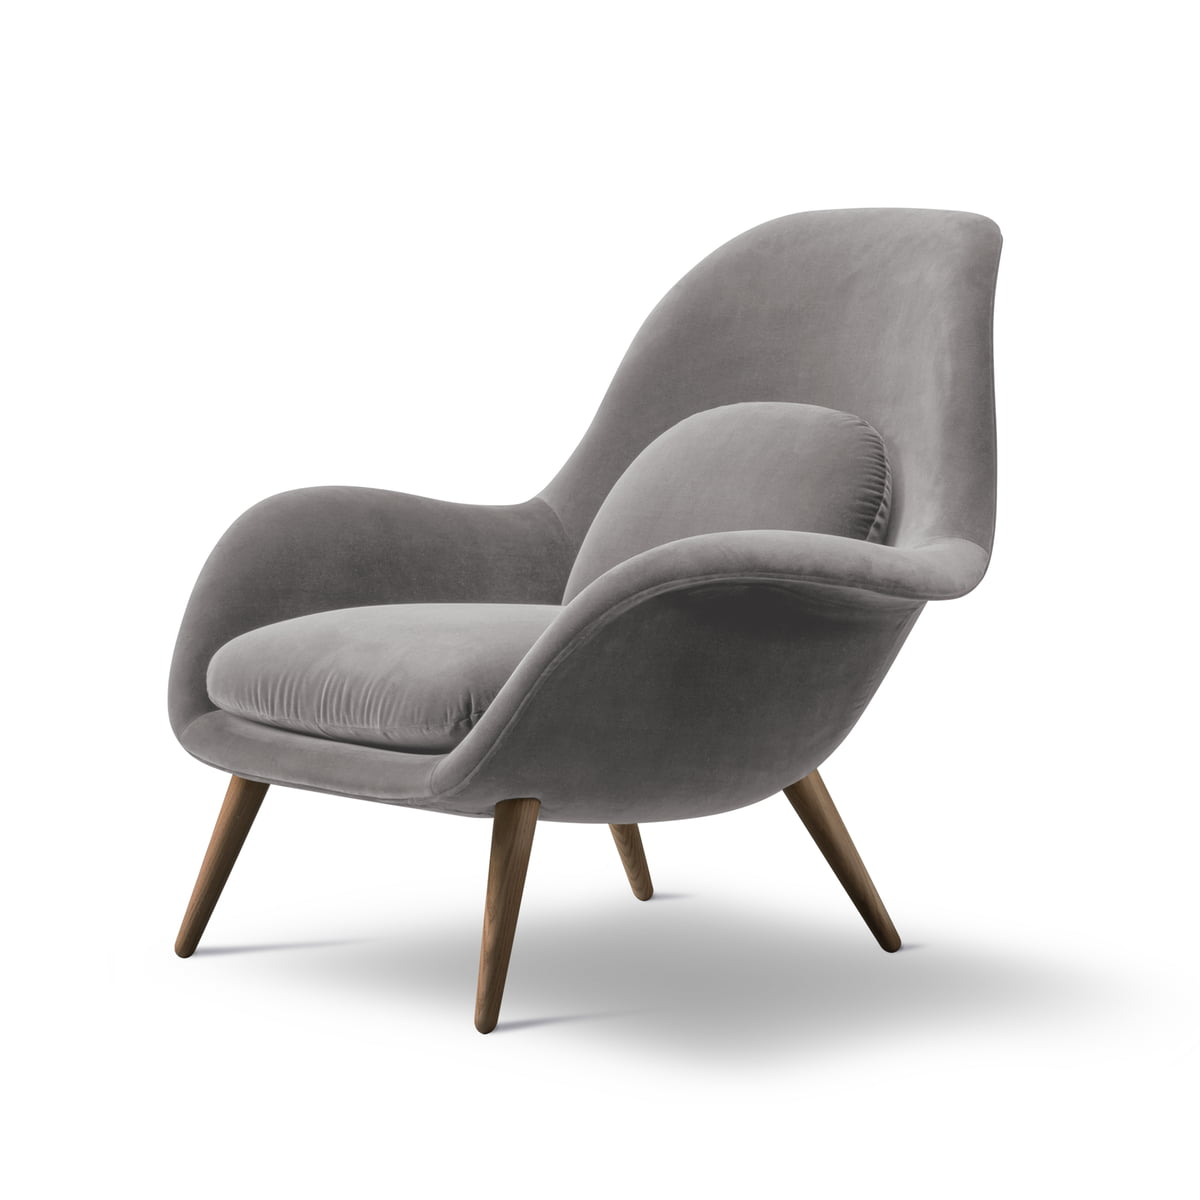 Swoon Chair Von Fredericia Connox Shop